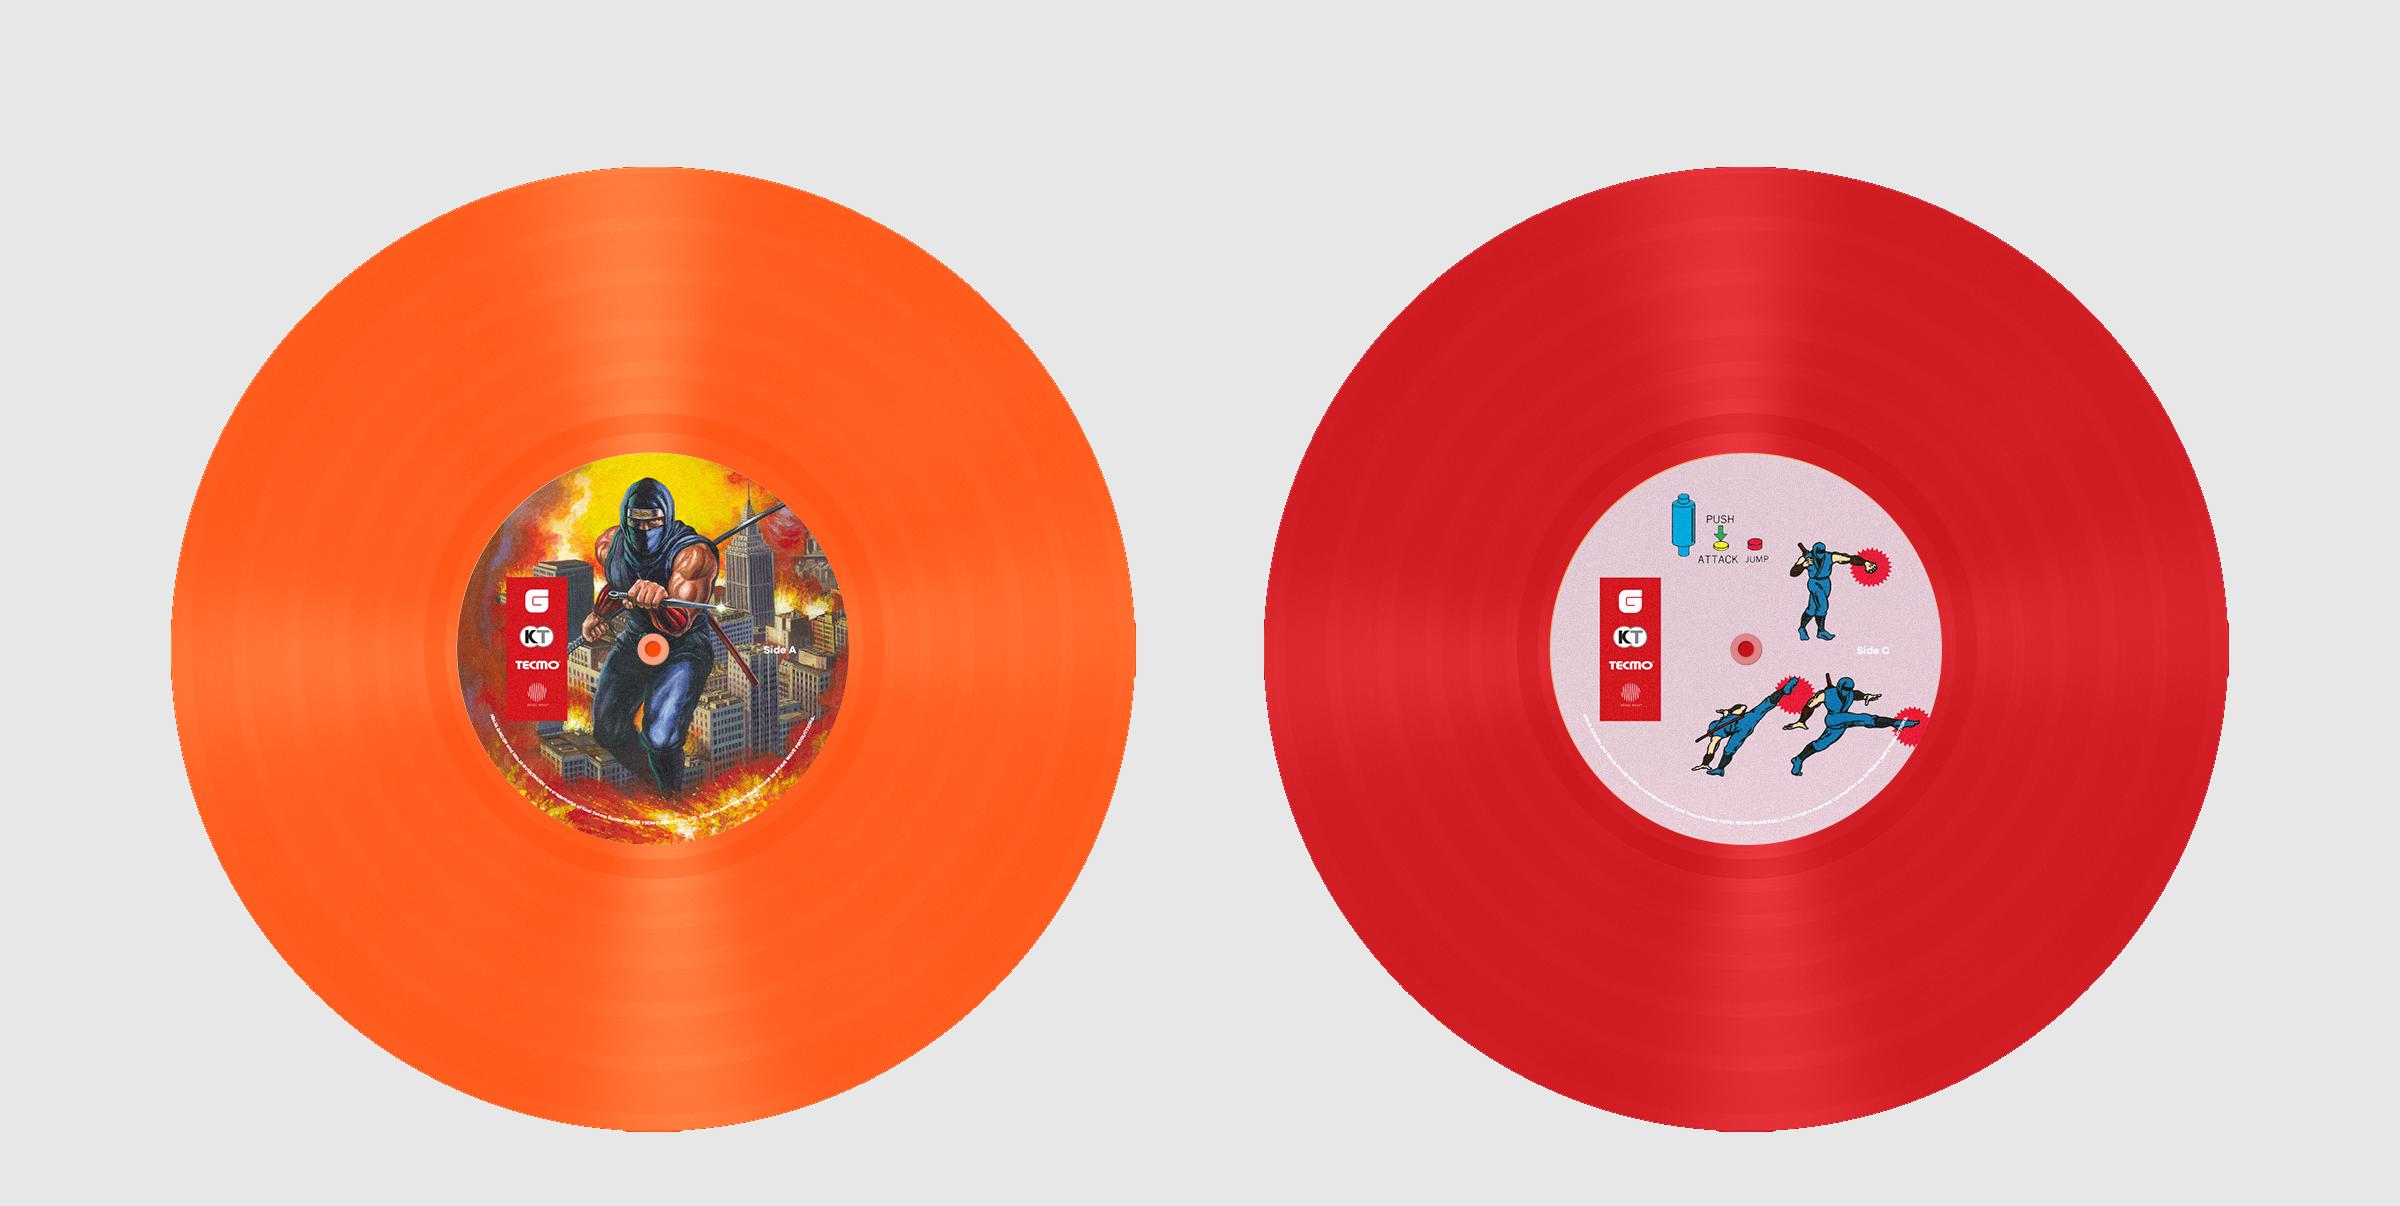 Ninja Gaiden The Definitive Soundtrack Vol. 1 Colored Vinyl and Label Designs